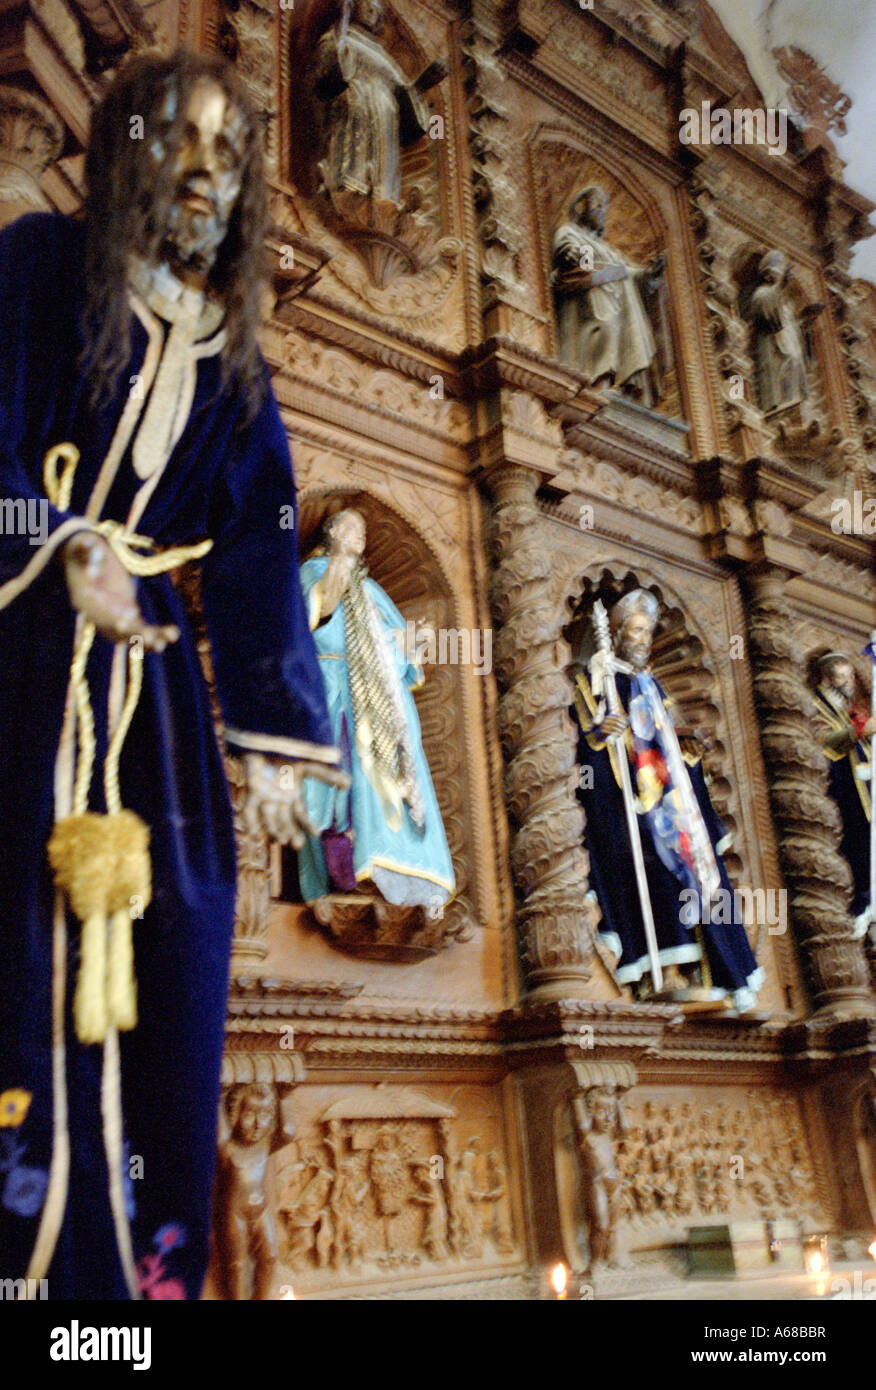 Religeous statues inside church at Santiago, Lake Atitlan, Guatemala. - Stock Image